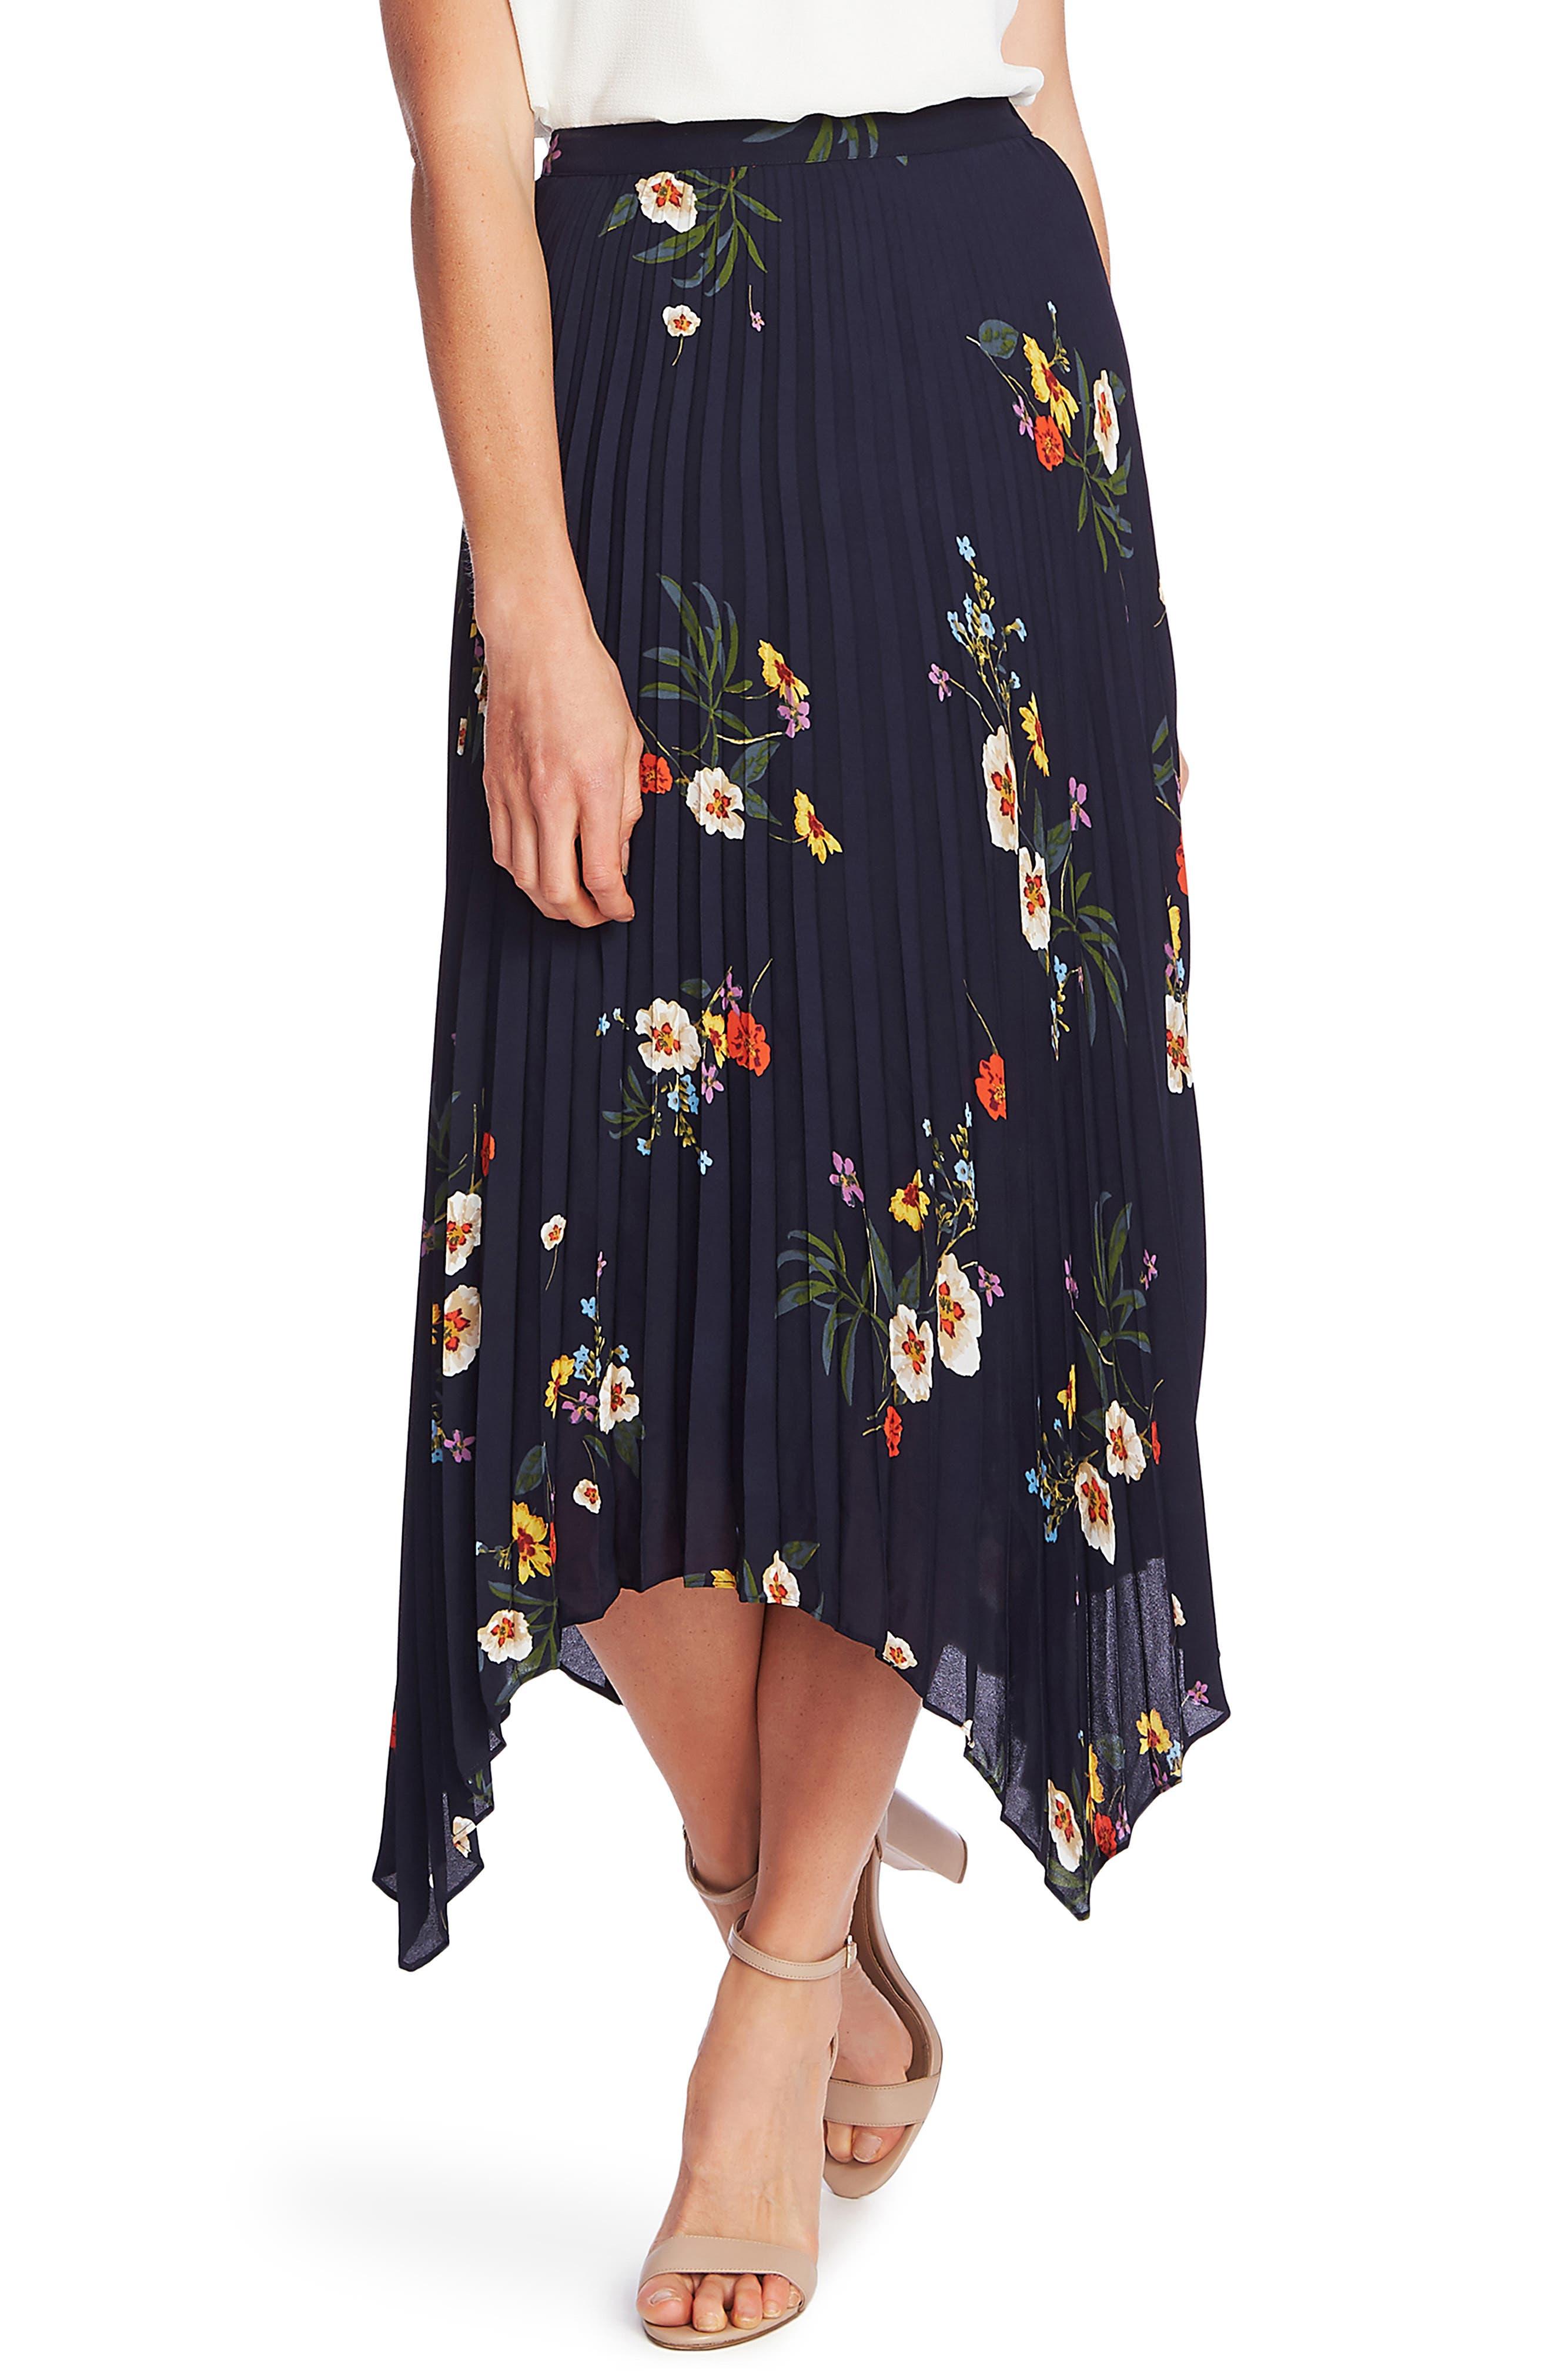 Retro Skirts: Vintage, Pencil, Circle, & Plus Sizes Womens Vince Camuto Surreal Garden Handkerchief Hem Pleated Skirt Size XX-Large - Blue $119.00 AT vintagedancer.com